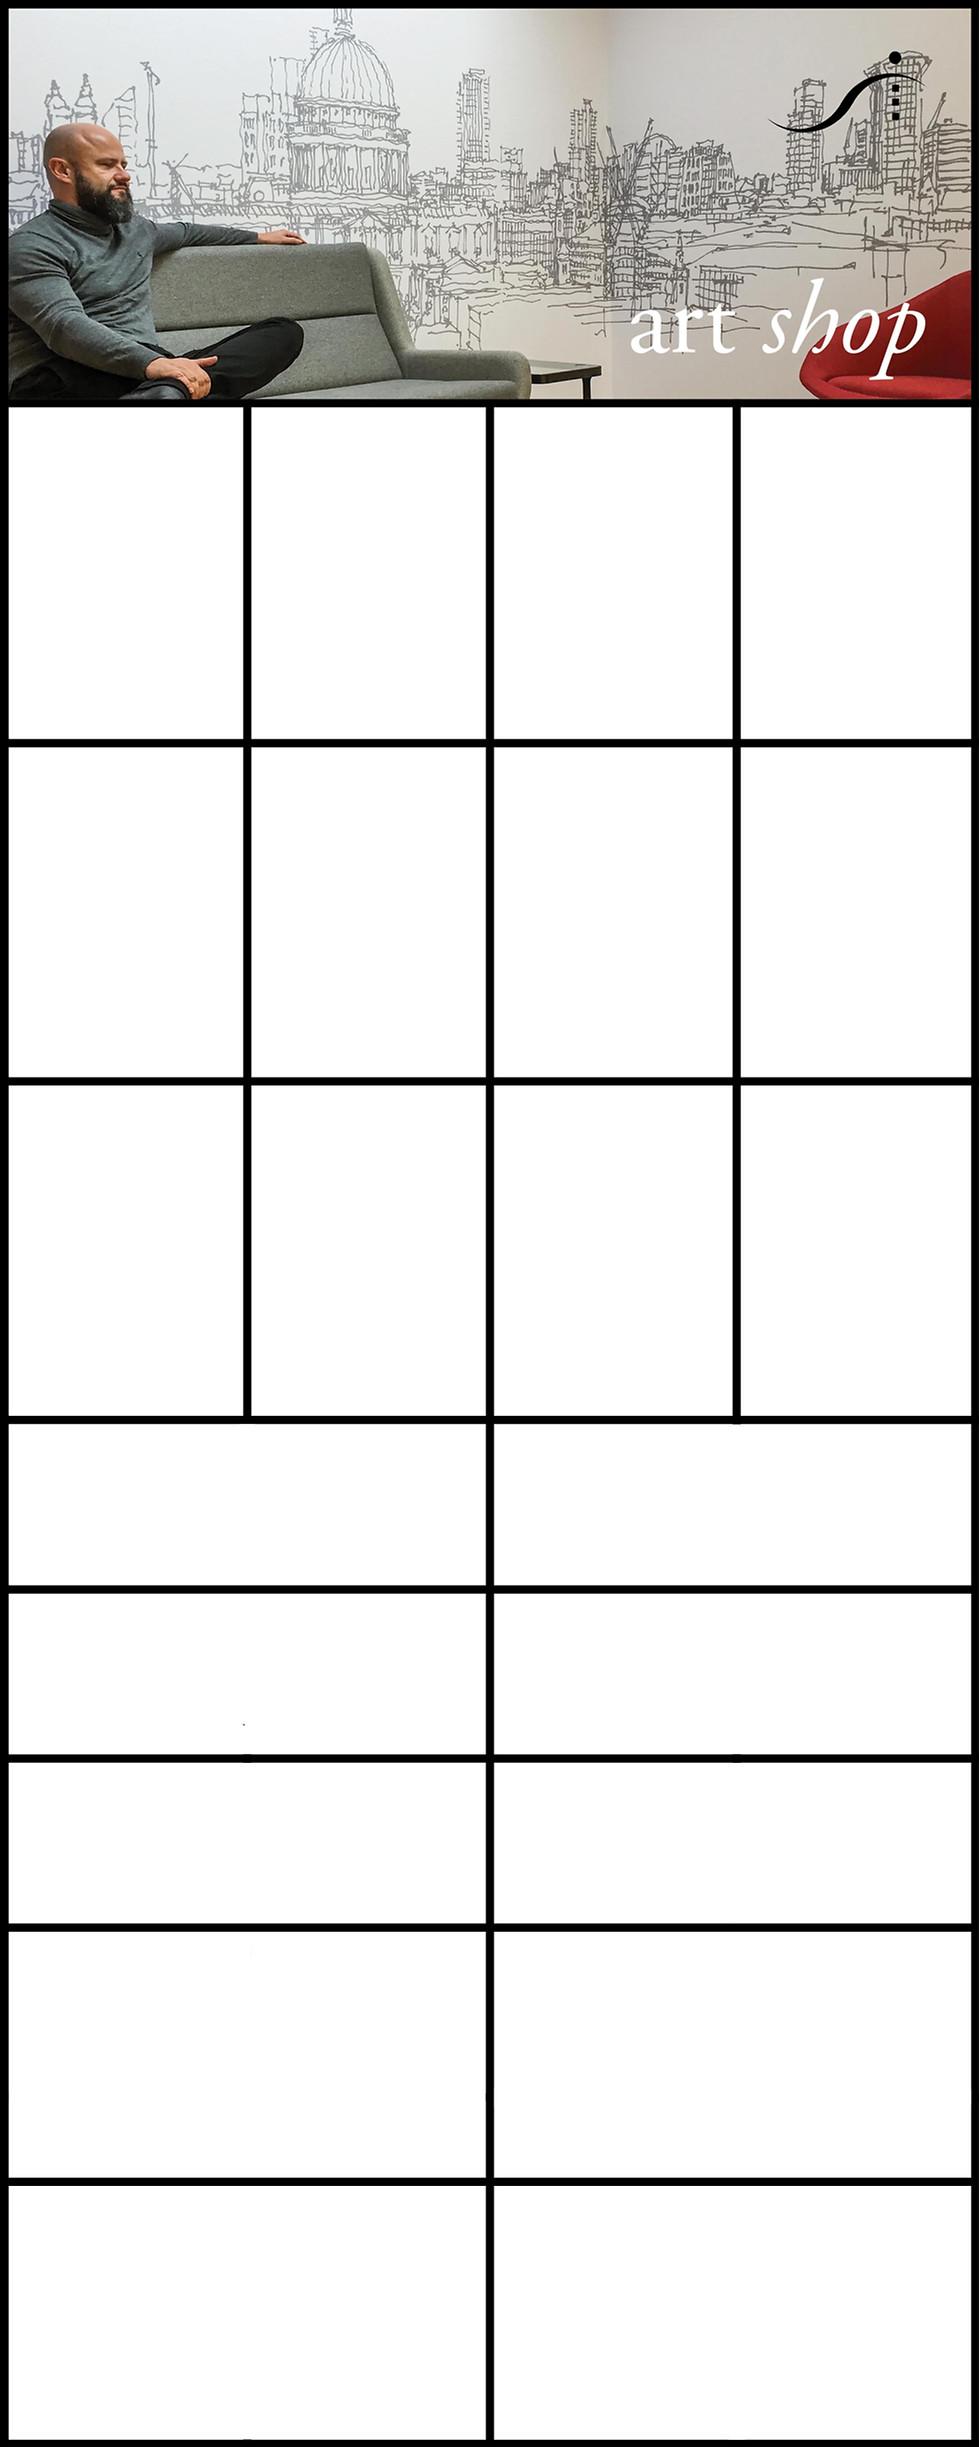 art shop grid 3.jpg